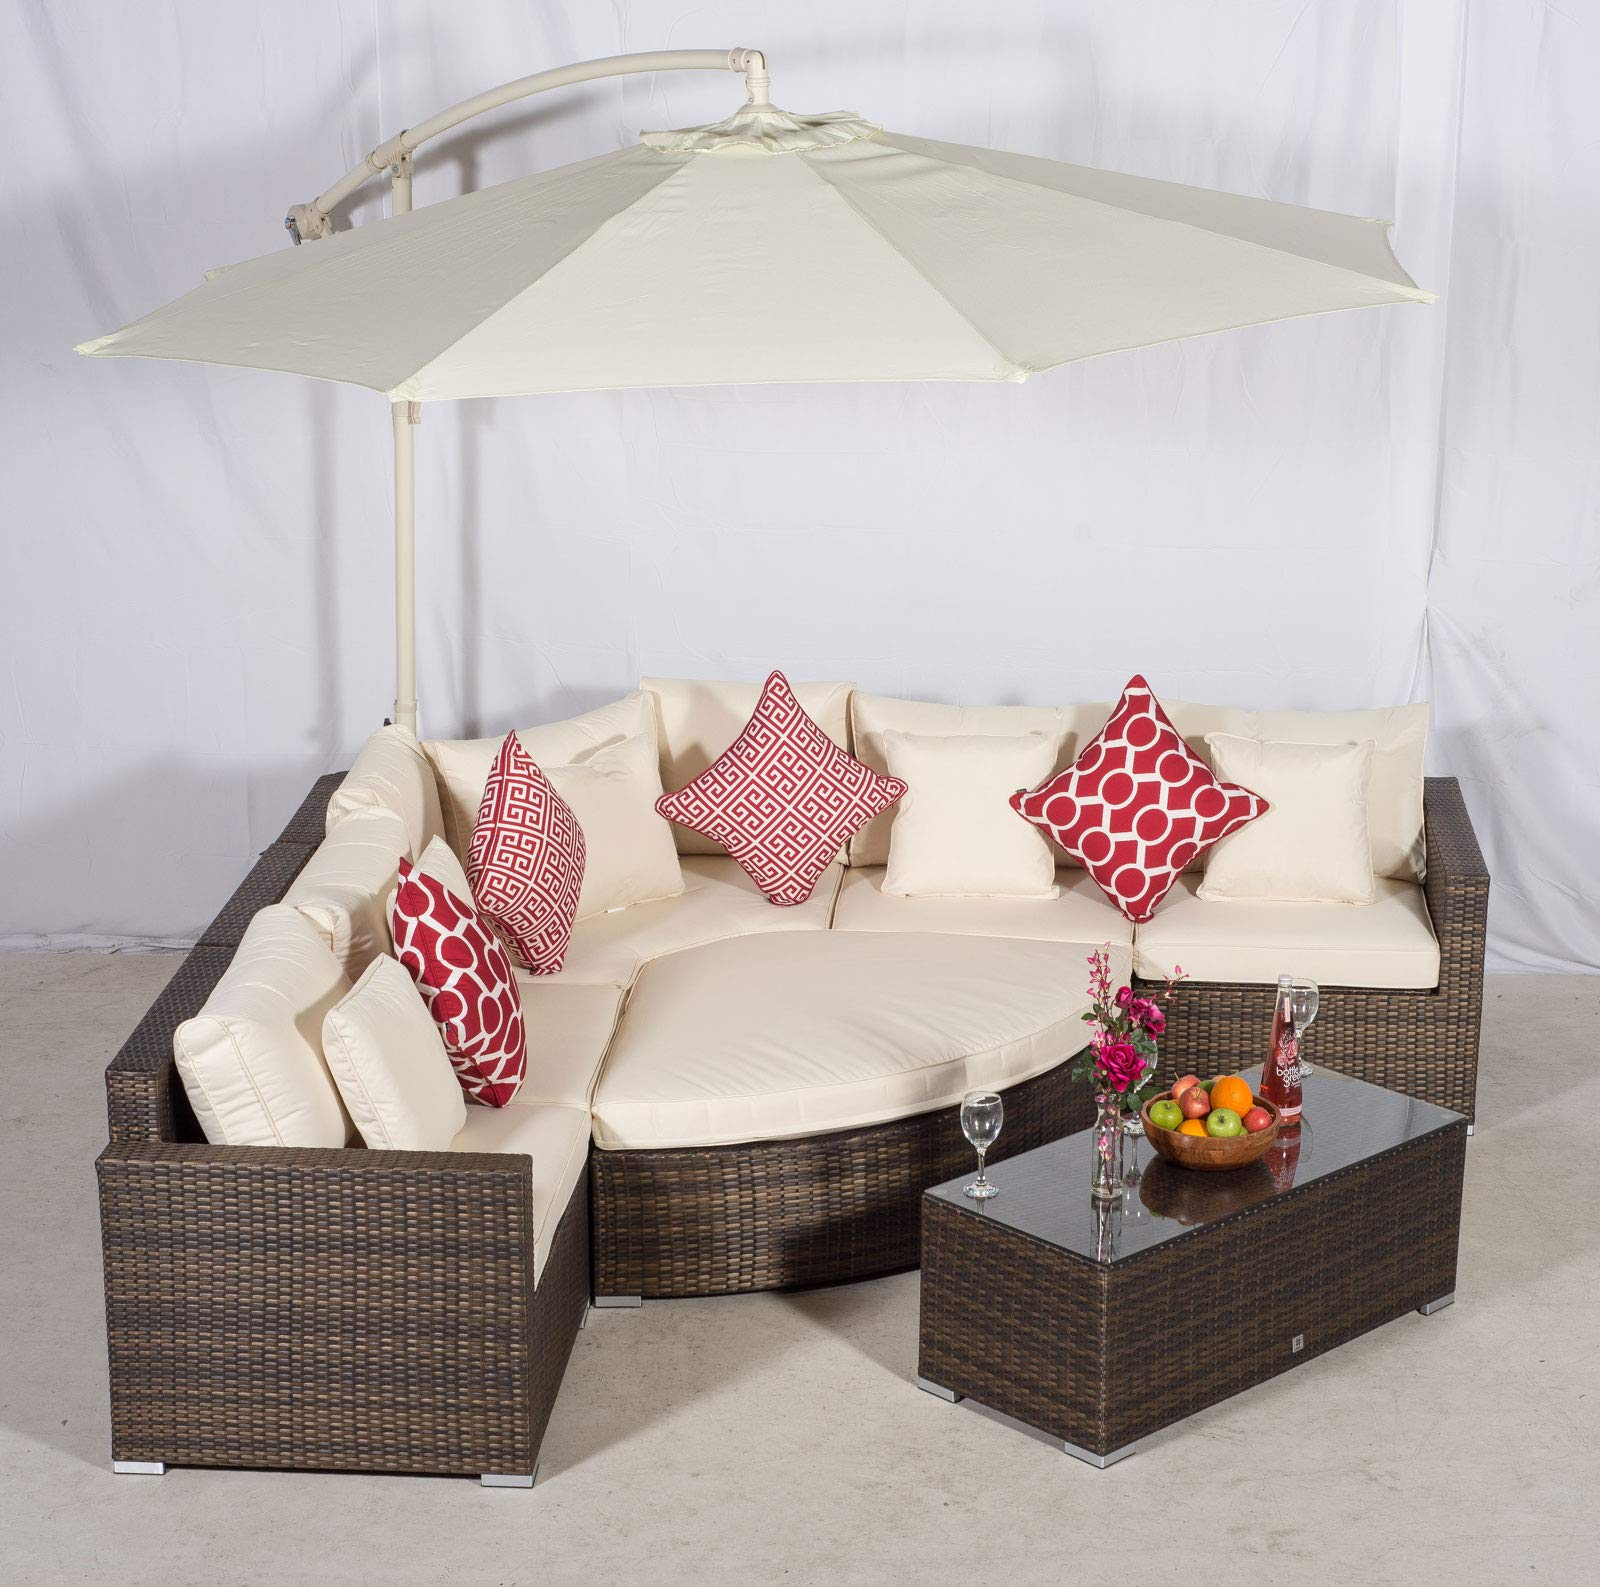 Fantastic Giardino Santorini 5 Seat Brown Rattan Corner Sofa Set Pabps2019 Chair Design Images Pabps2019Com